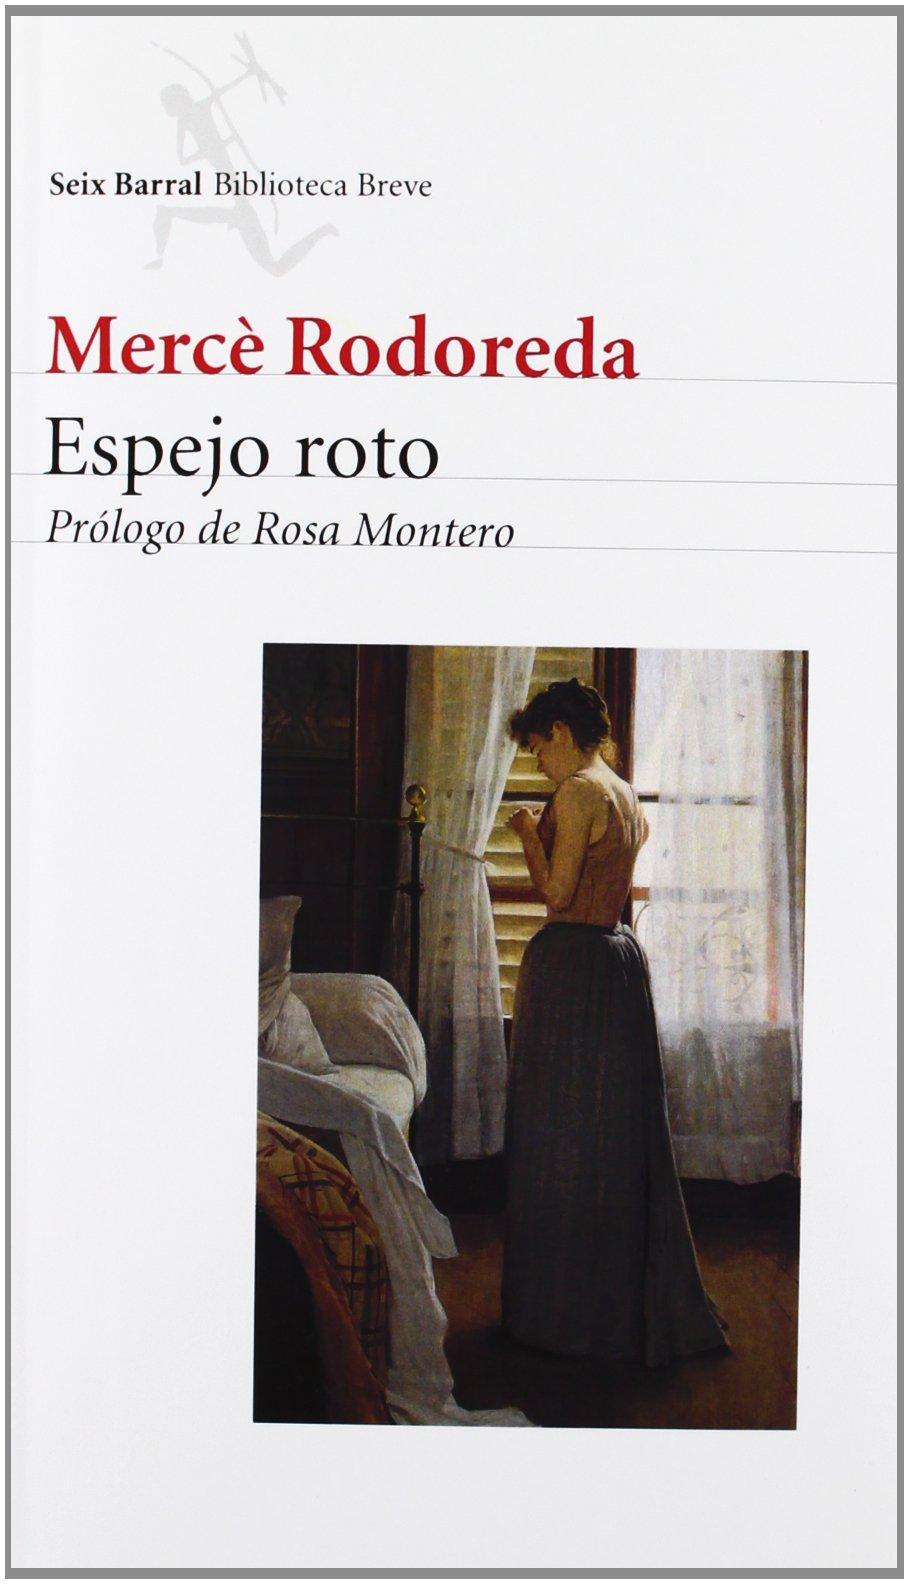 Espejo roto (Biblioteca Breve): Amazon.es: Mercè Rodoreda: Libros